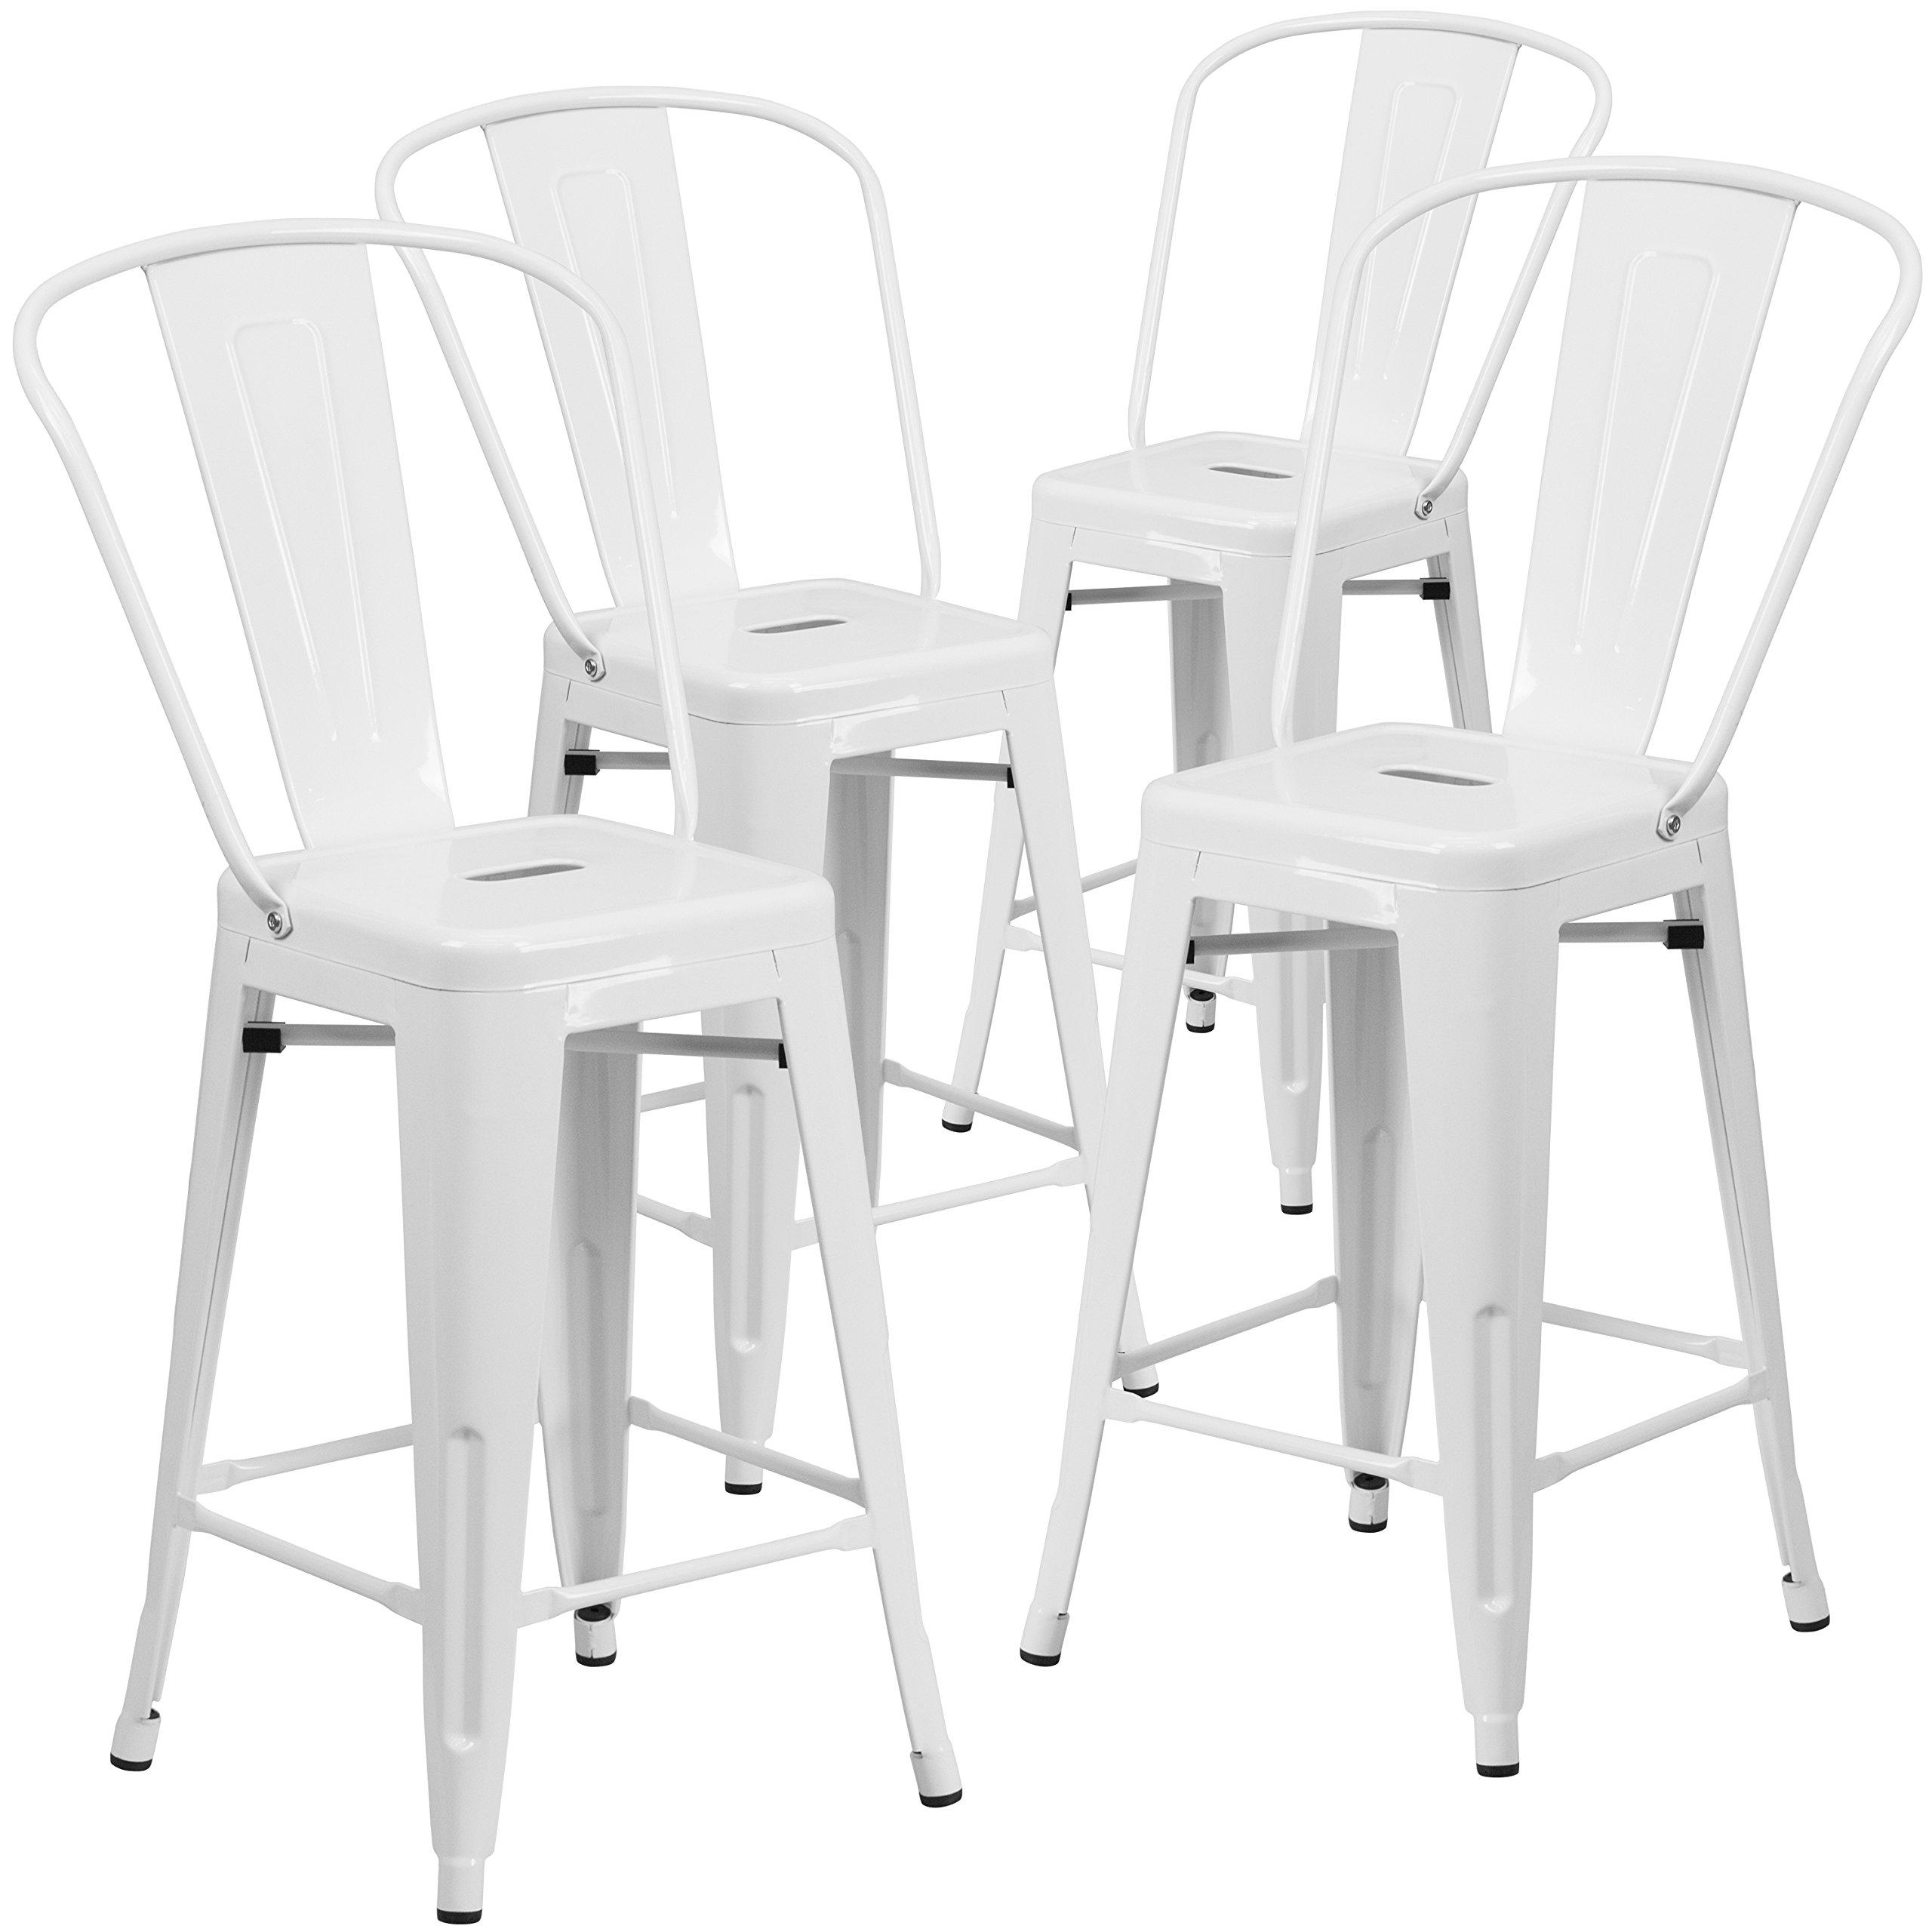 Flash Furniture 4 Pk 24 High White Metal Indoor Outdoor